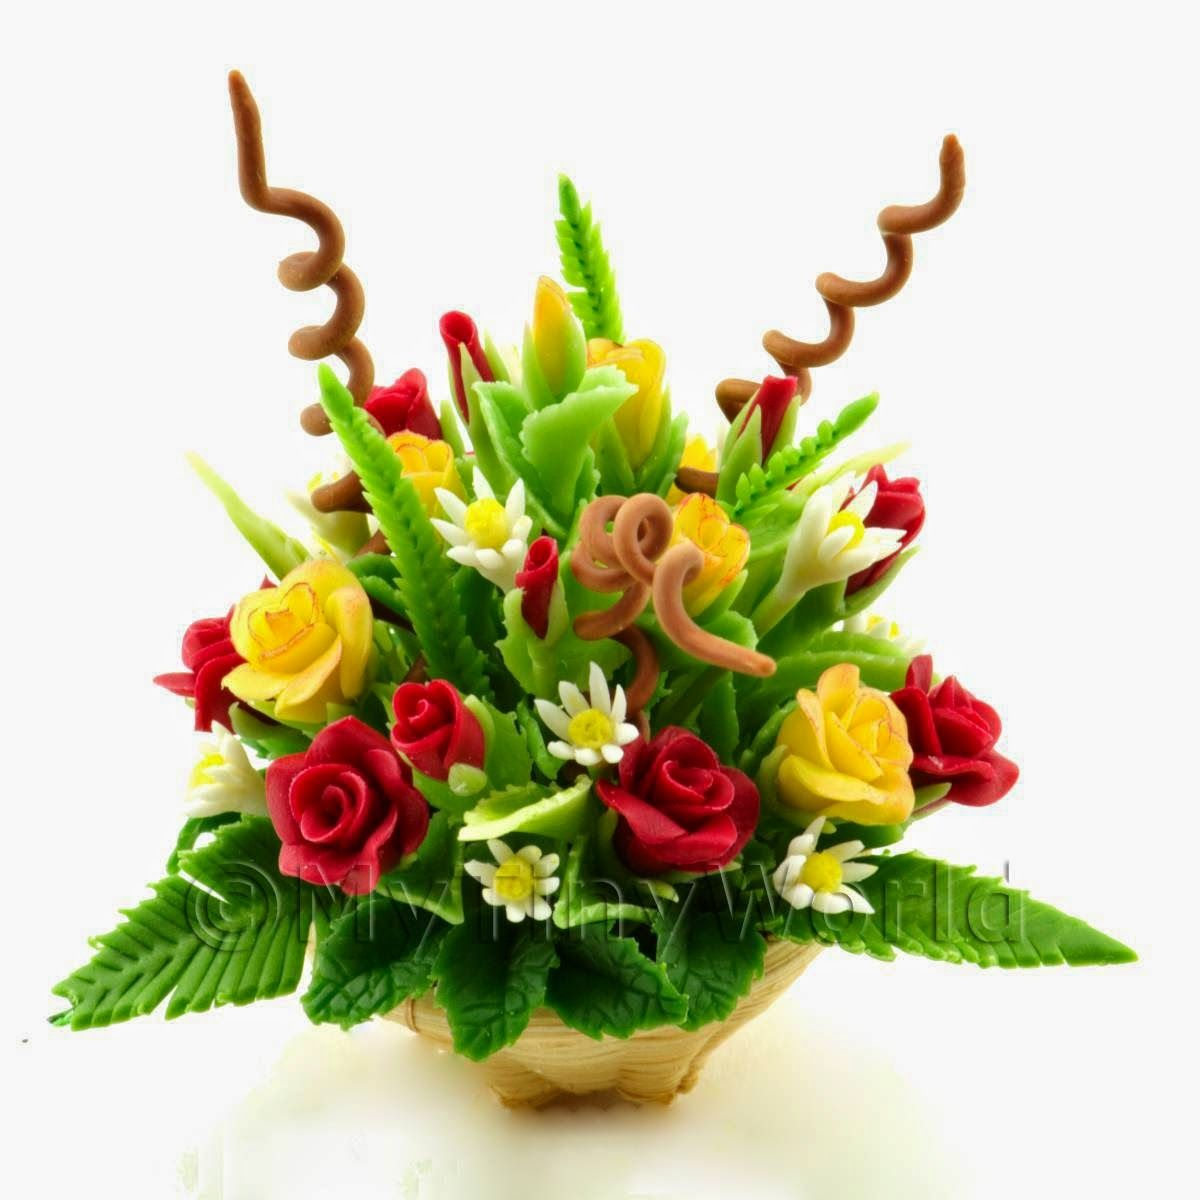 Ganesh chaturthi flowers may flower blog - Flower